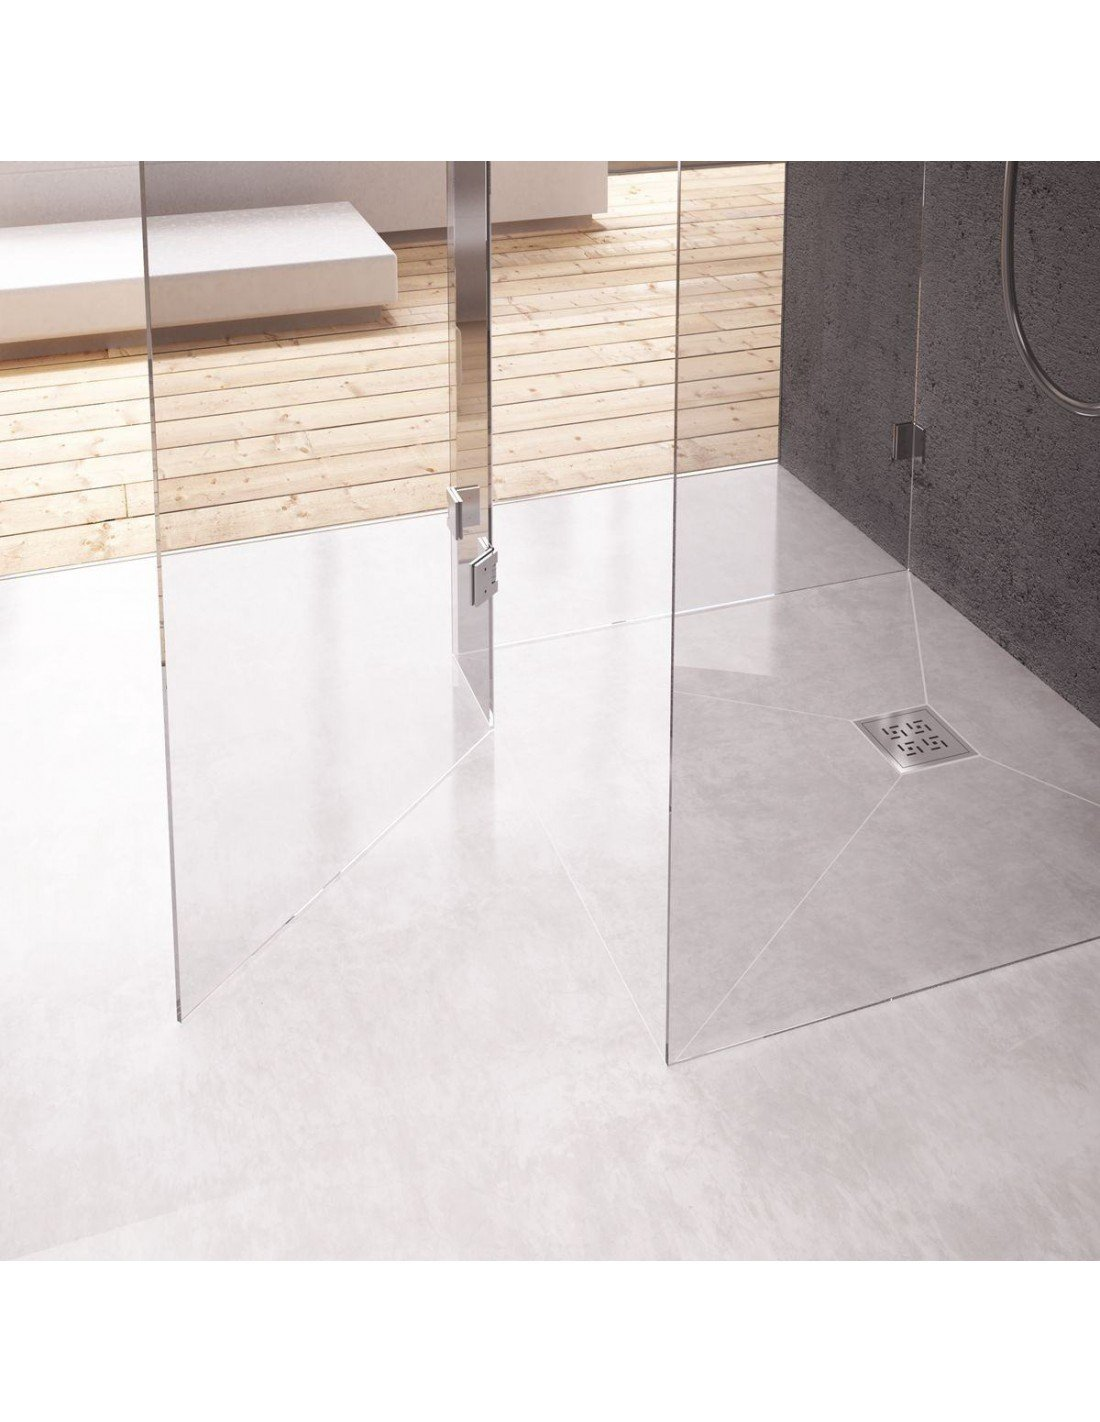 wet room kit shower tray walk in shower tray former linear. Black Bedroom Furniture Sets. Home Design Ideas